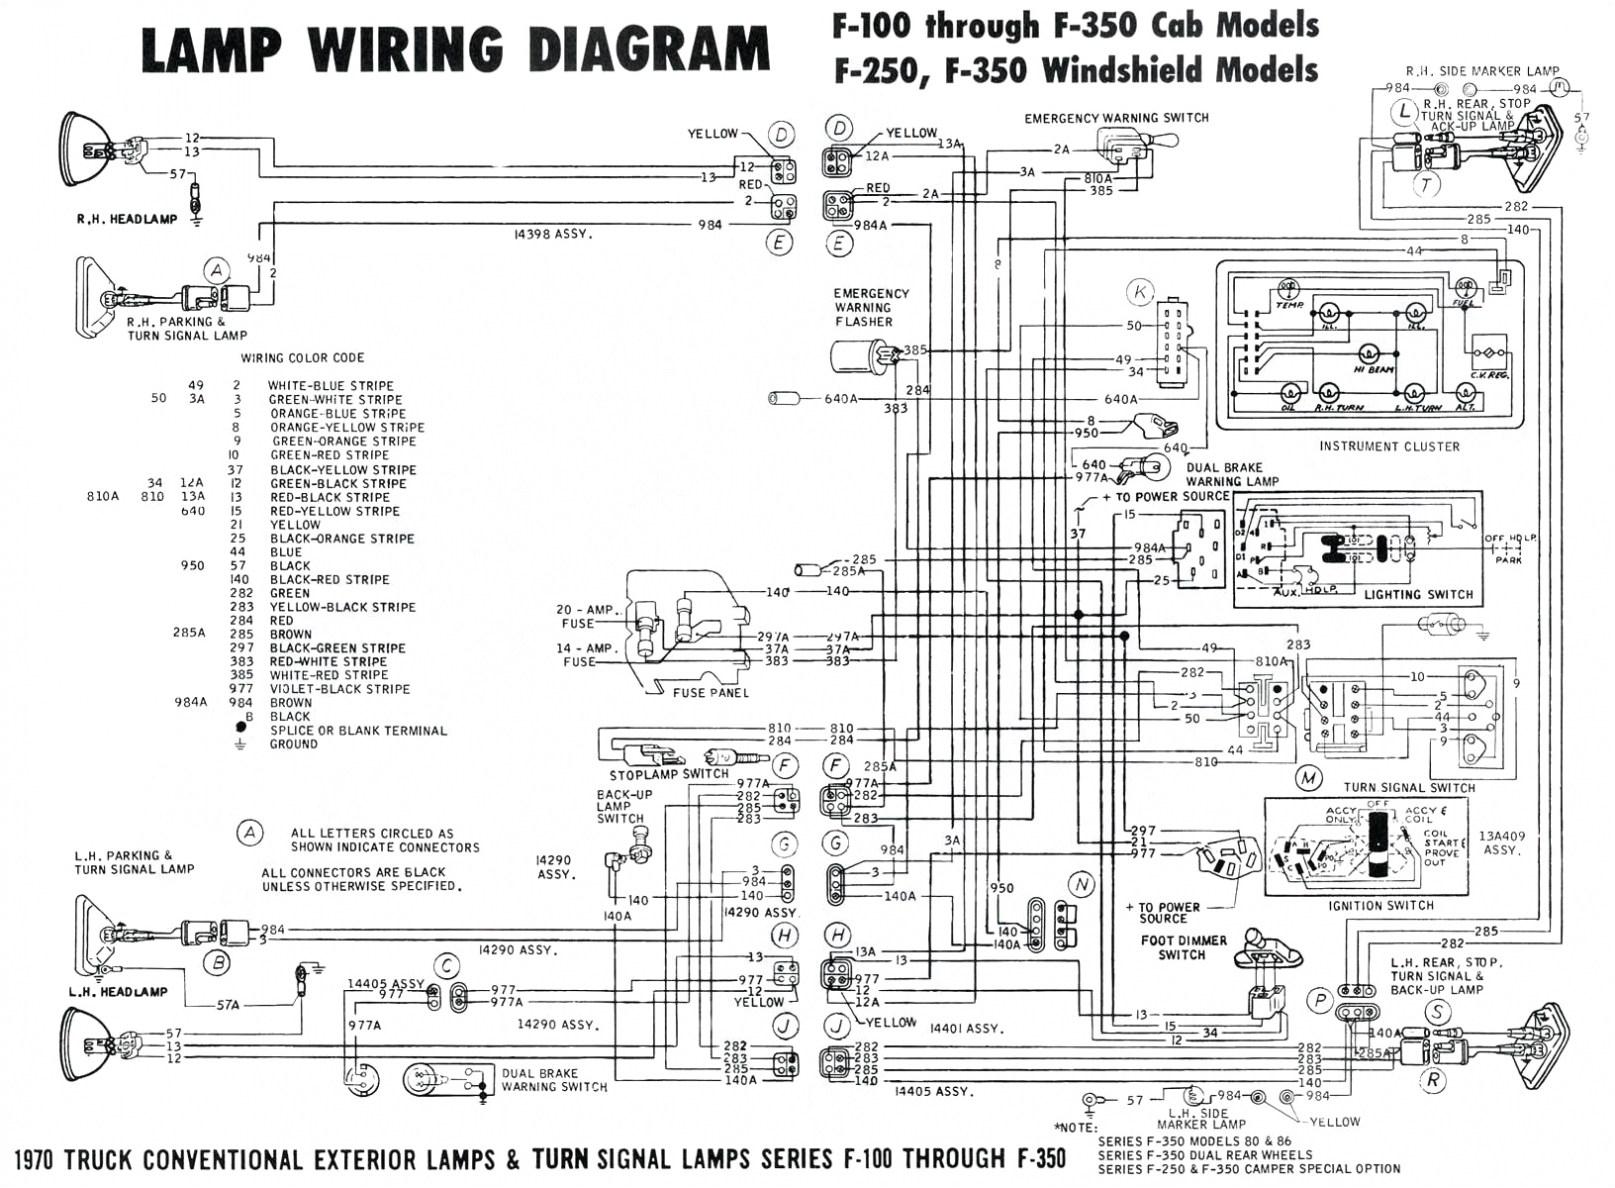 imperial range wiring diagrams wiring diagram sheet imperial range wiring diagram imperial range wiring diagram